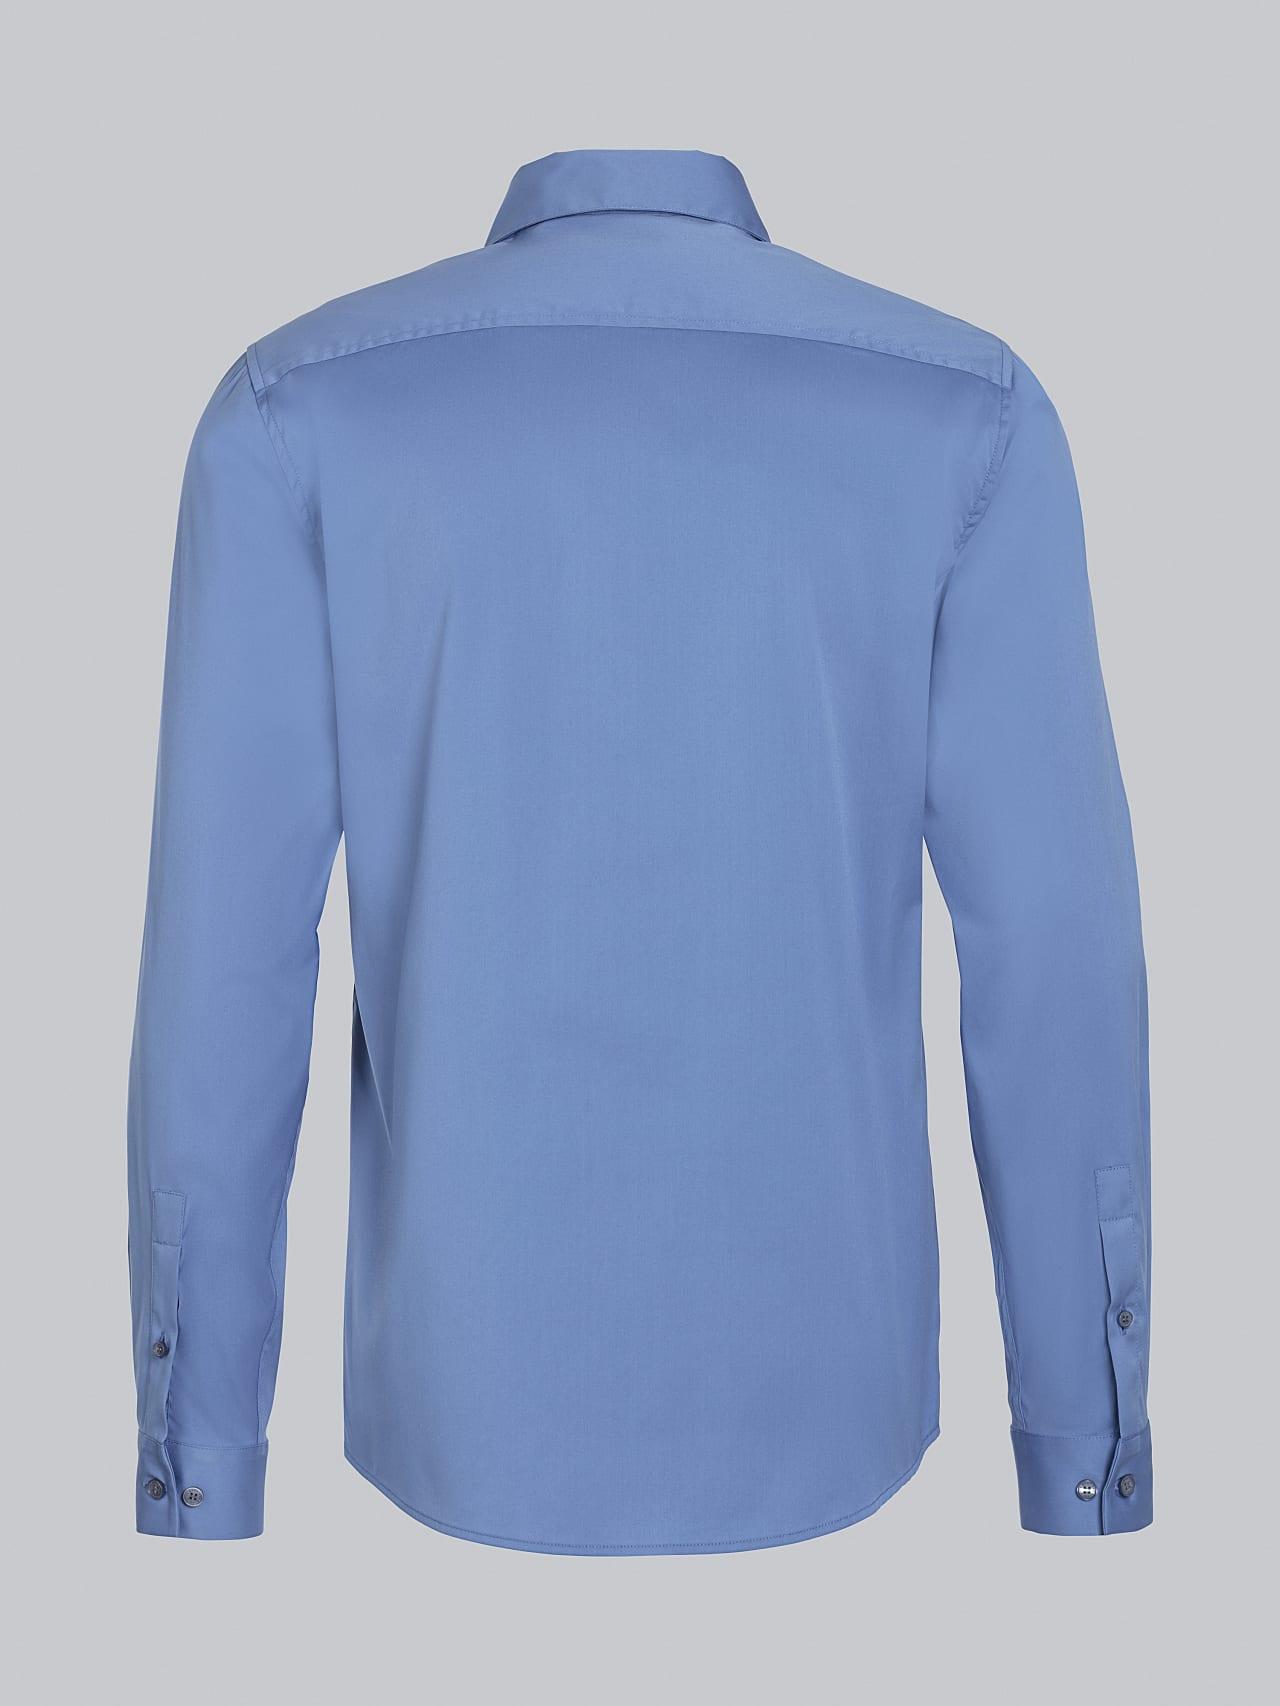 WAARG V2.Y5.02 Easy-Care Cotton Shirt light blue Left Alpha Tauri